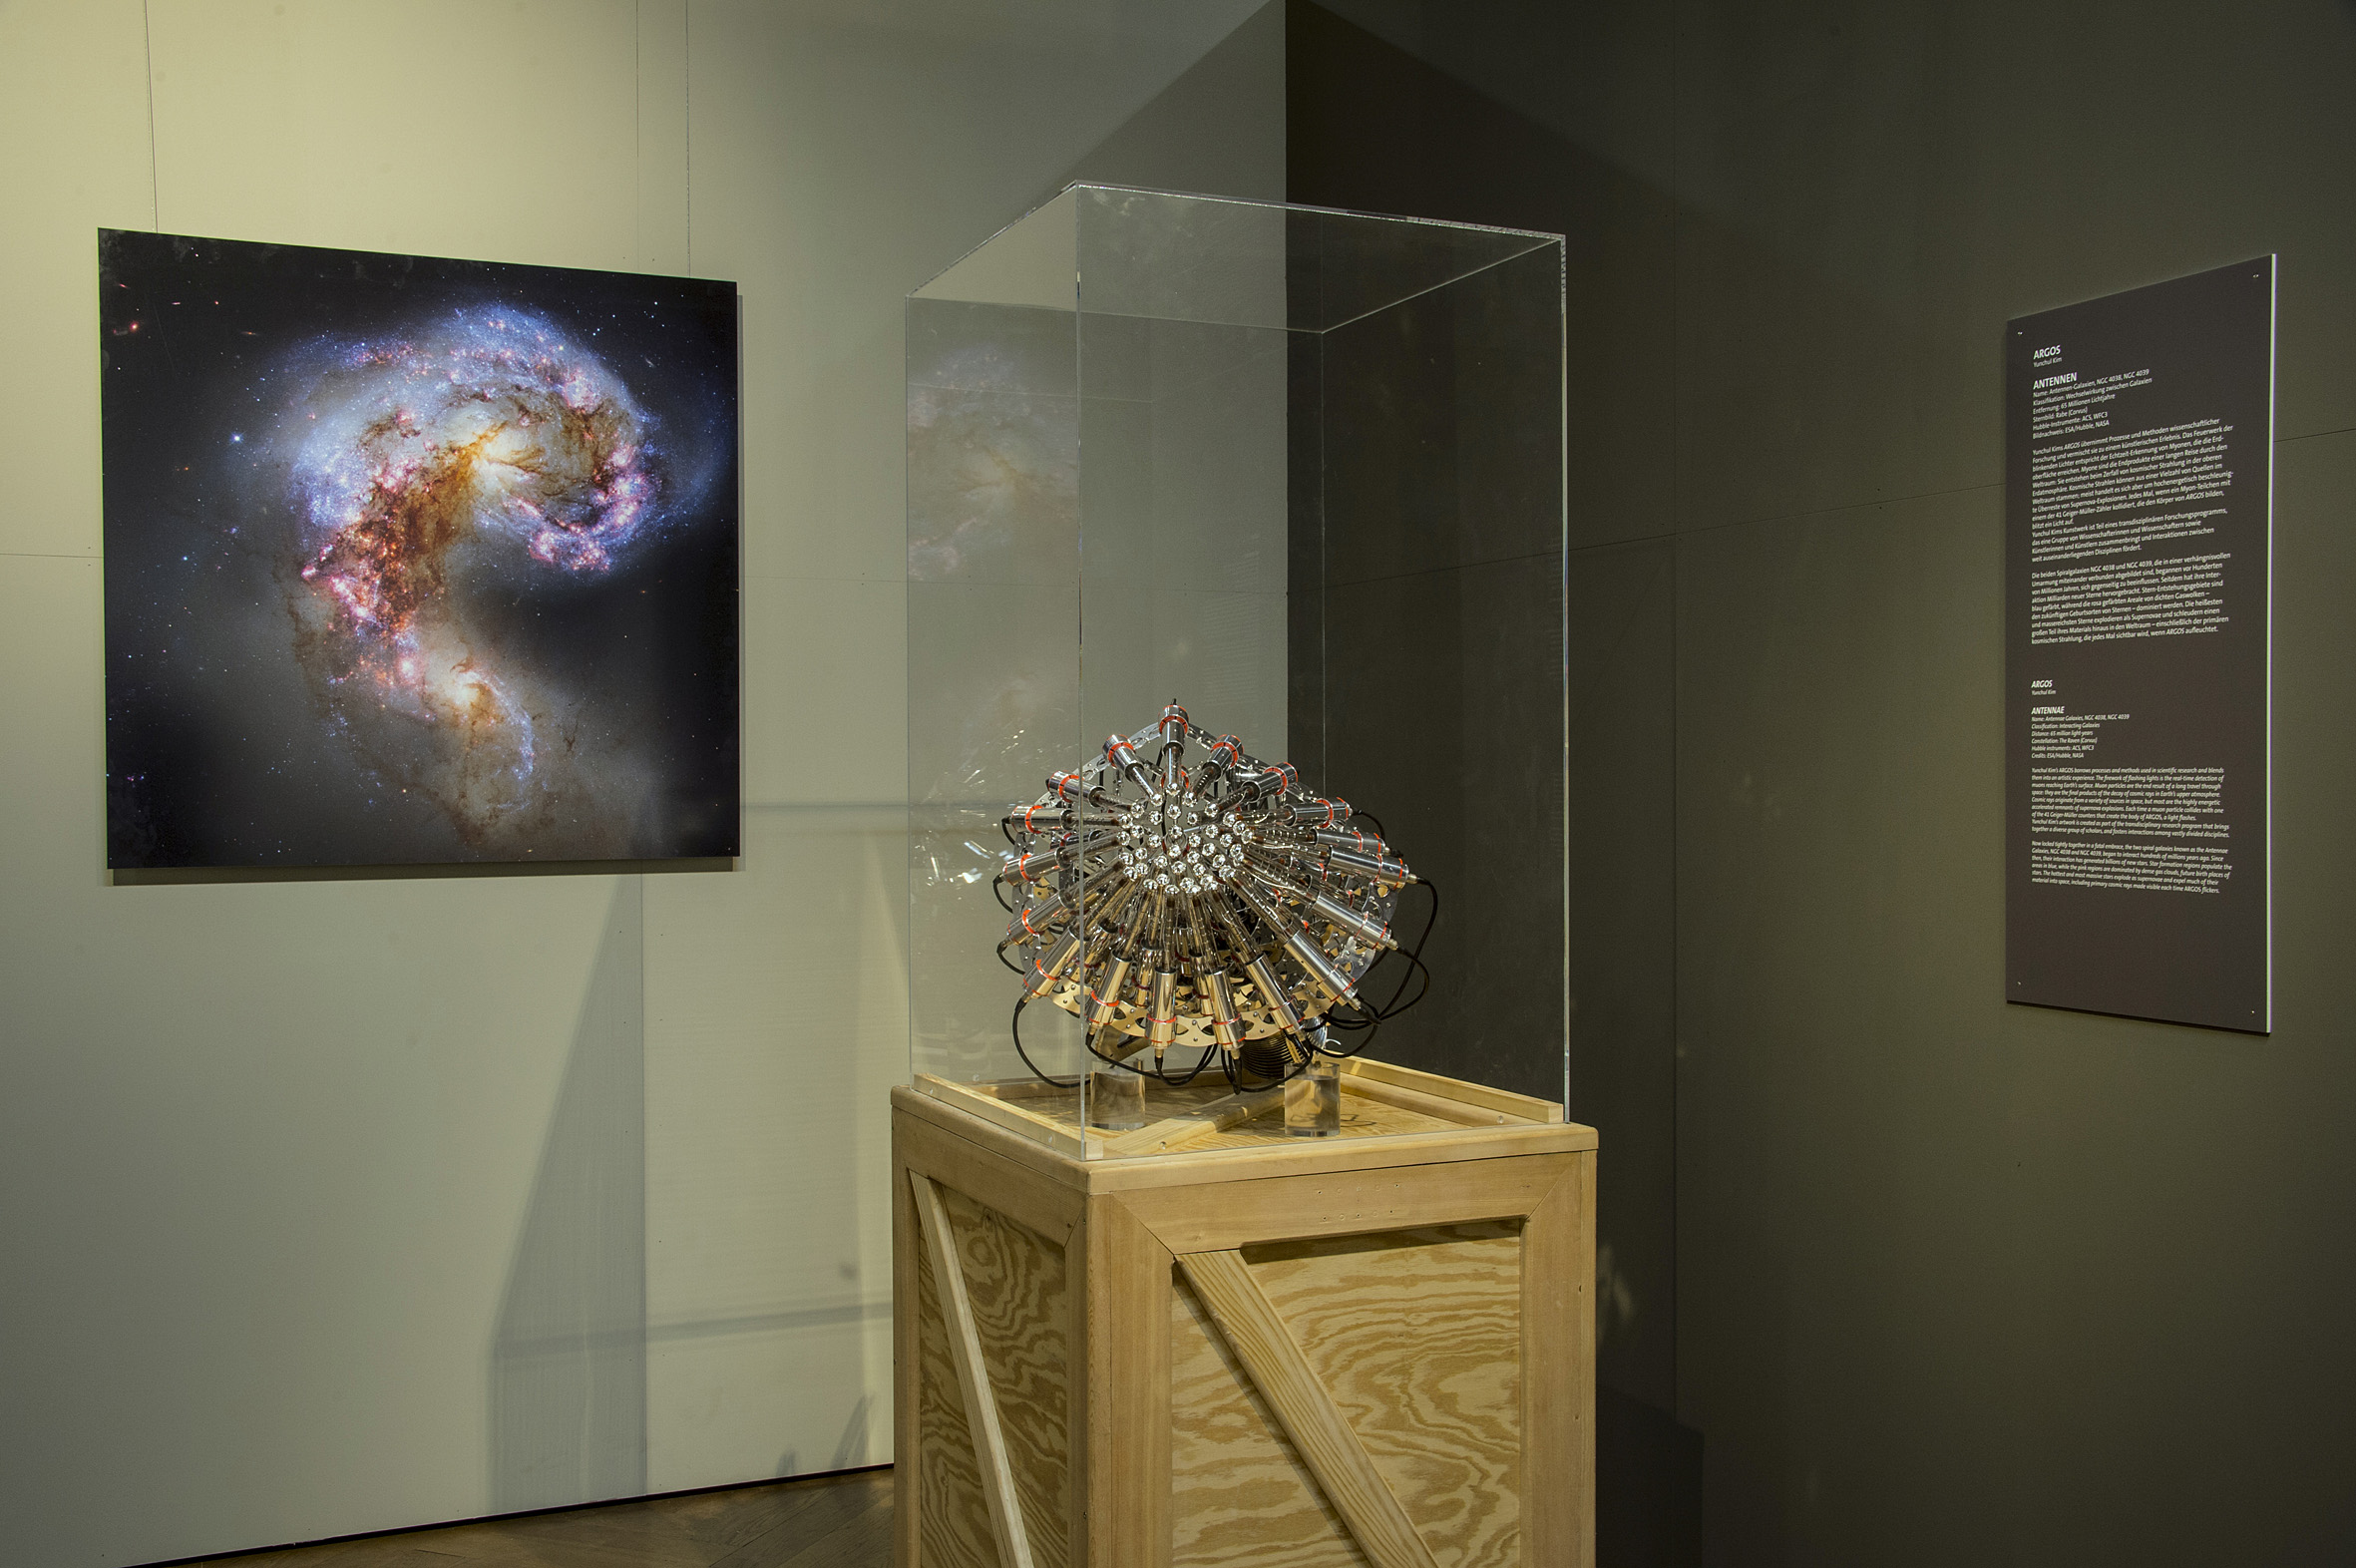 Exhibition Light D Model : Cosmic light esa hubble